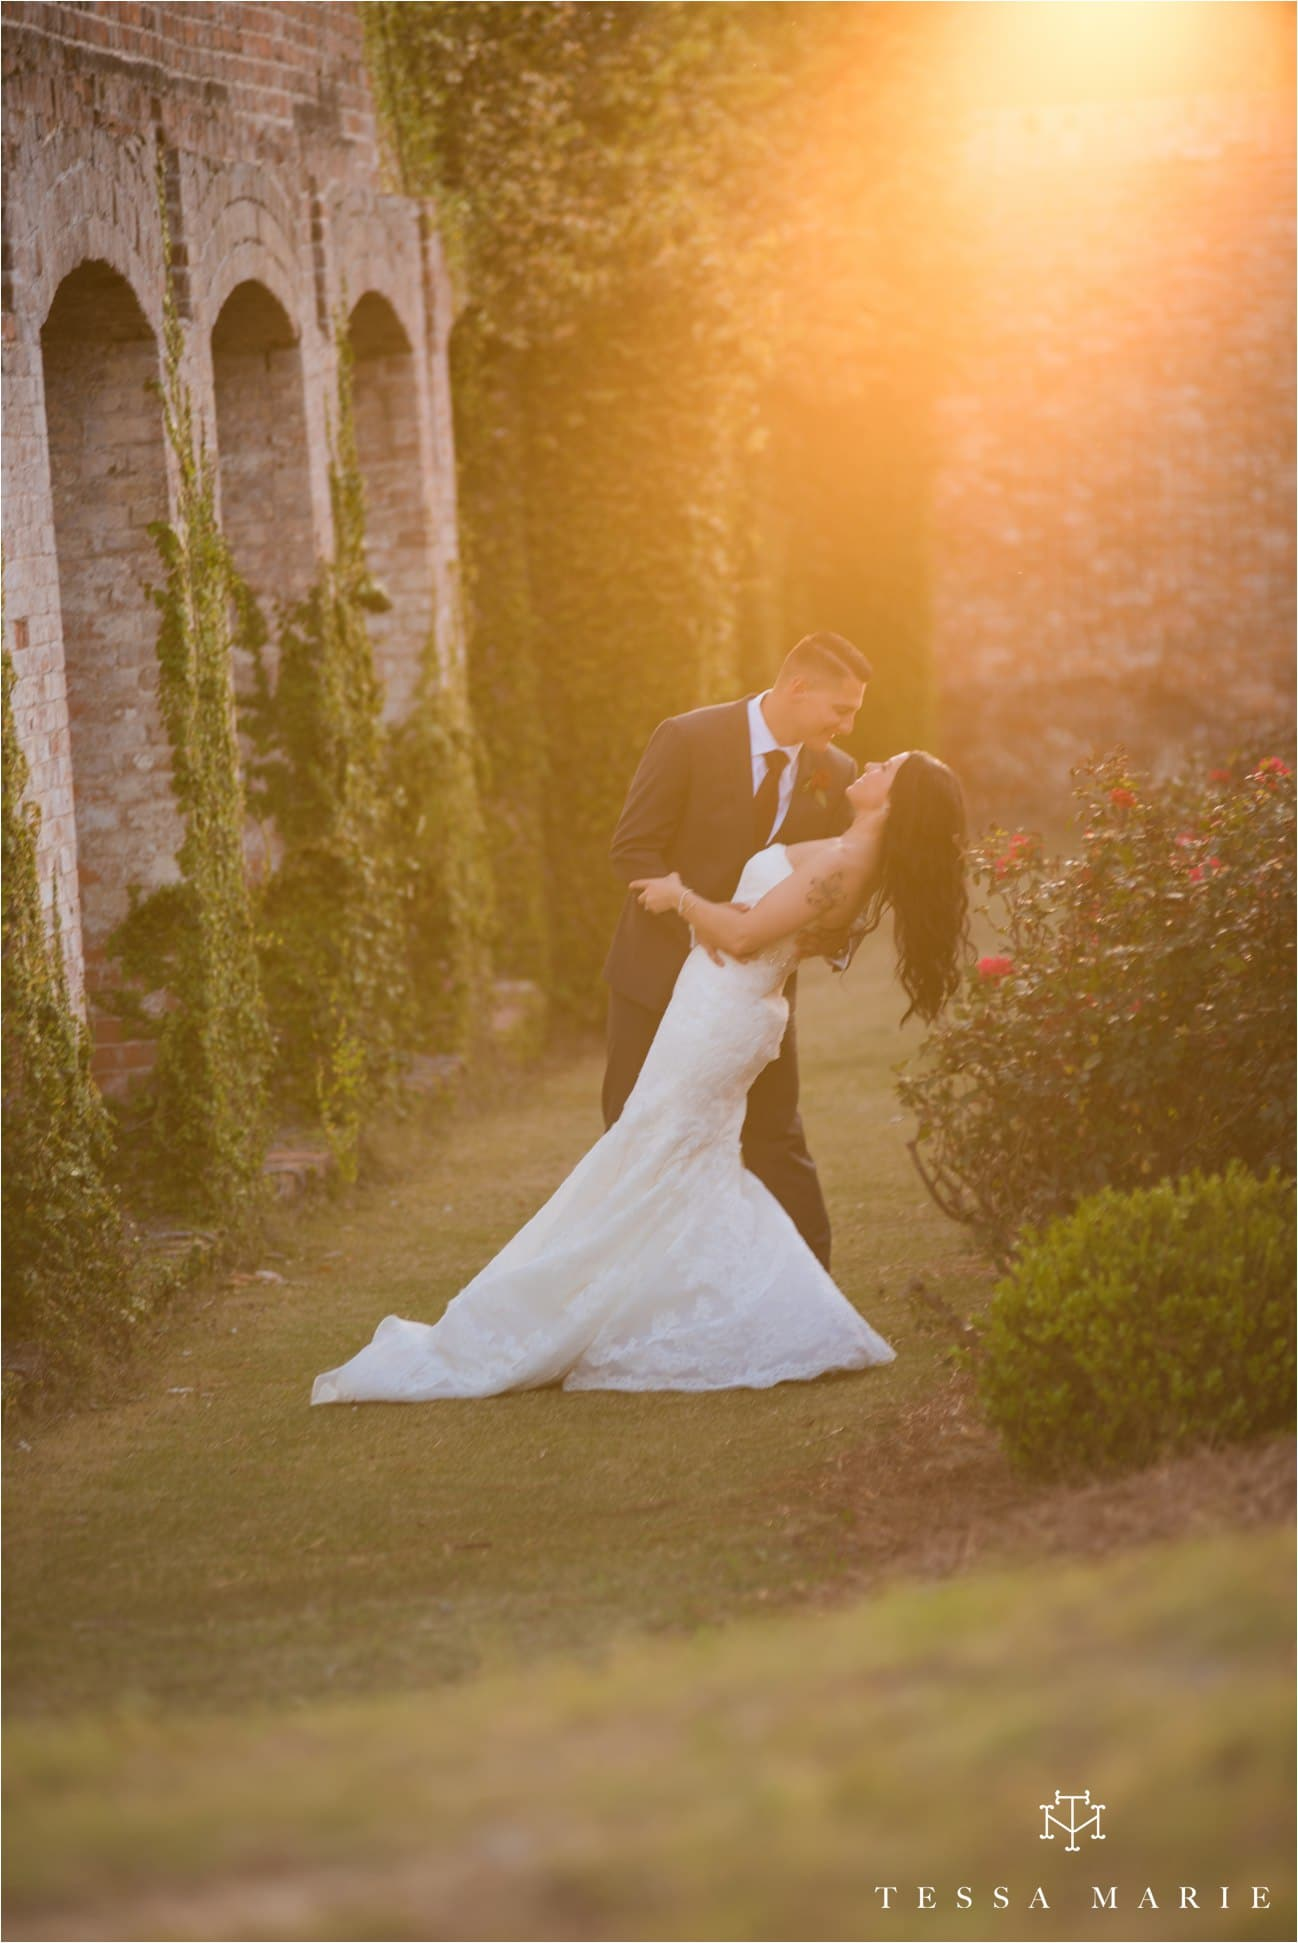 tessa_marie_weddings_rivermill_event_centere_candid_outdoor_wedding_photos_0294